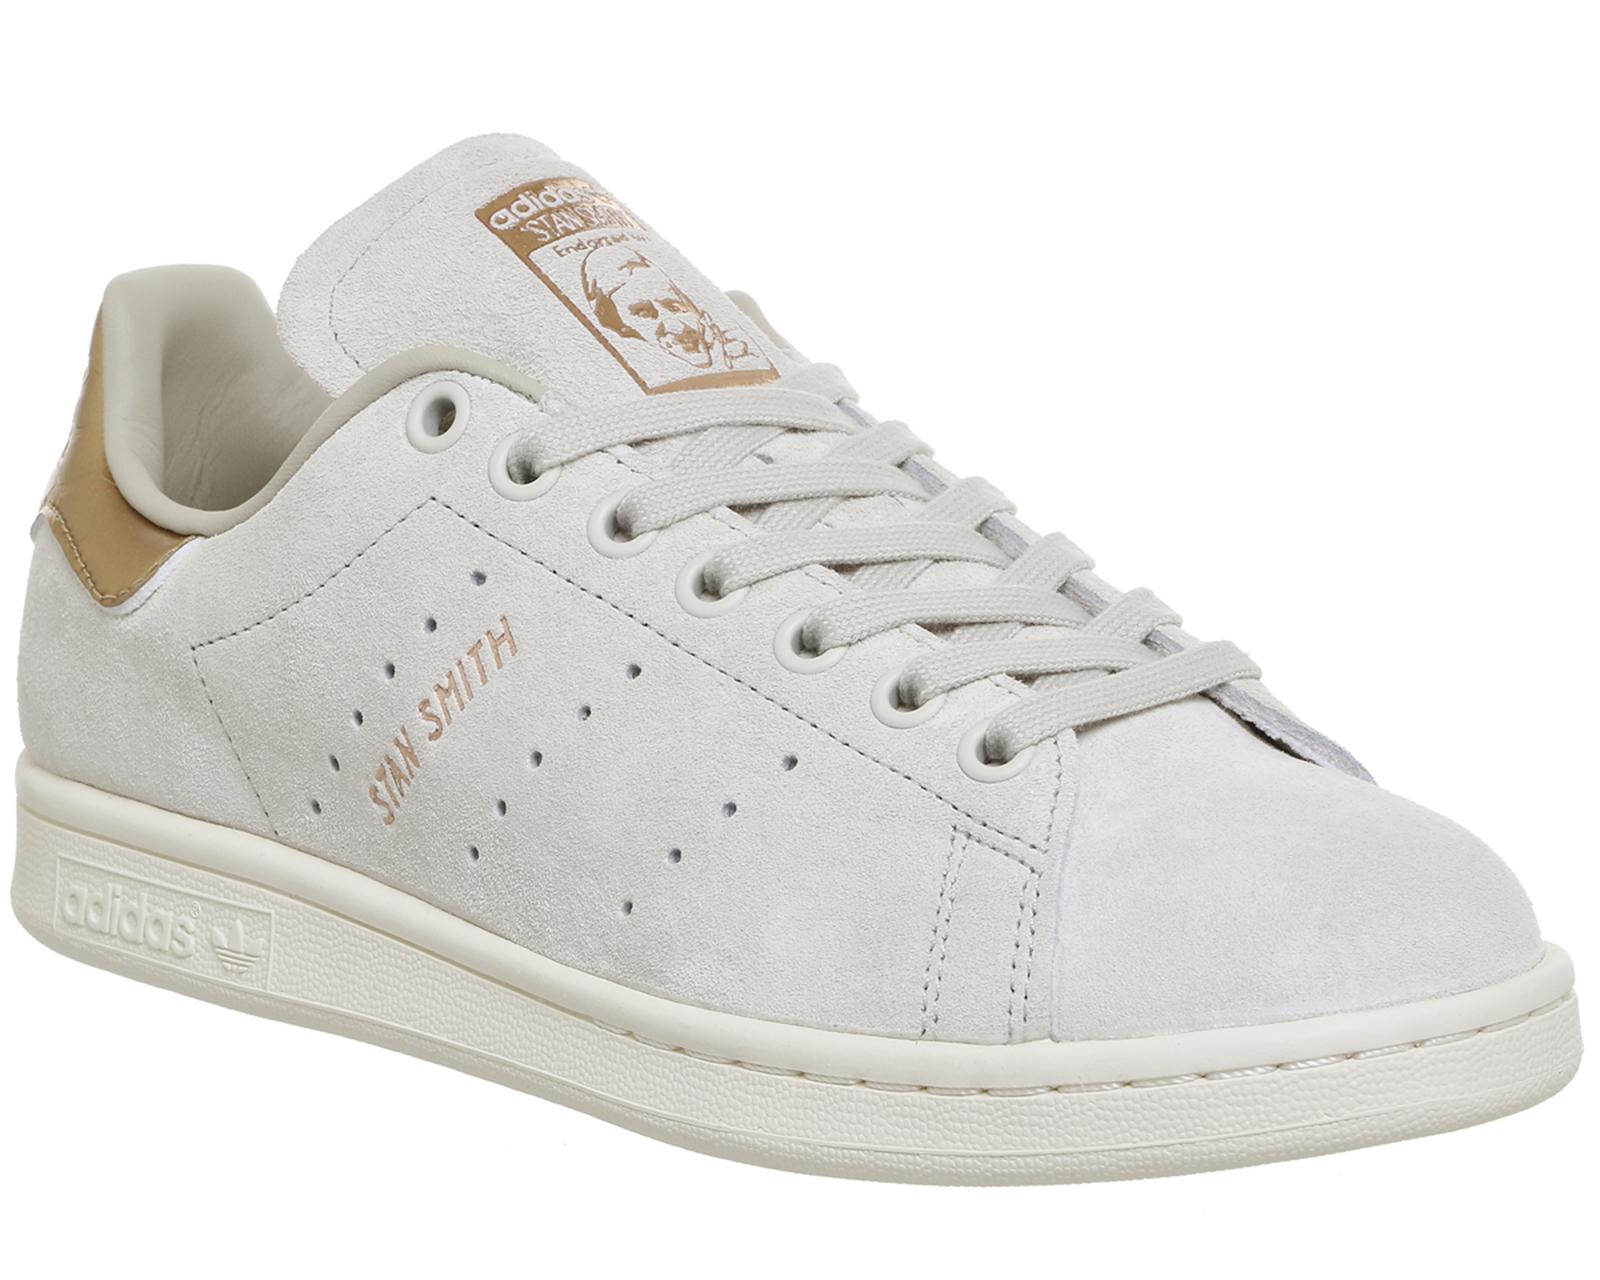 Donna Adidas Originals Stan Smith Scarpe da ginnastica in bianco sporco da Get The Label